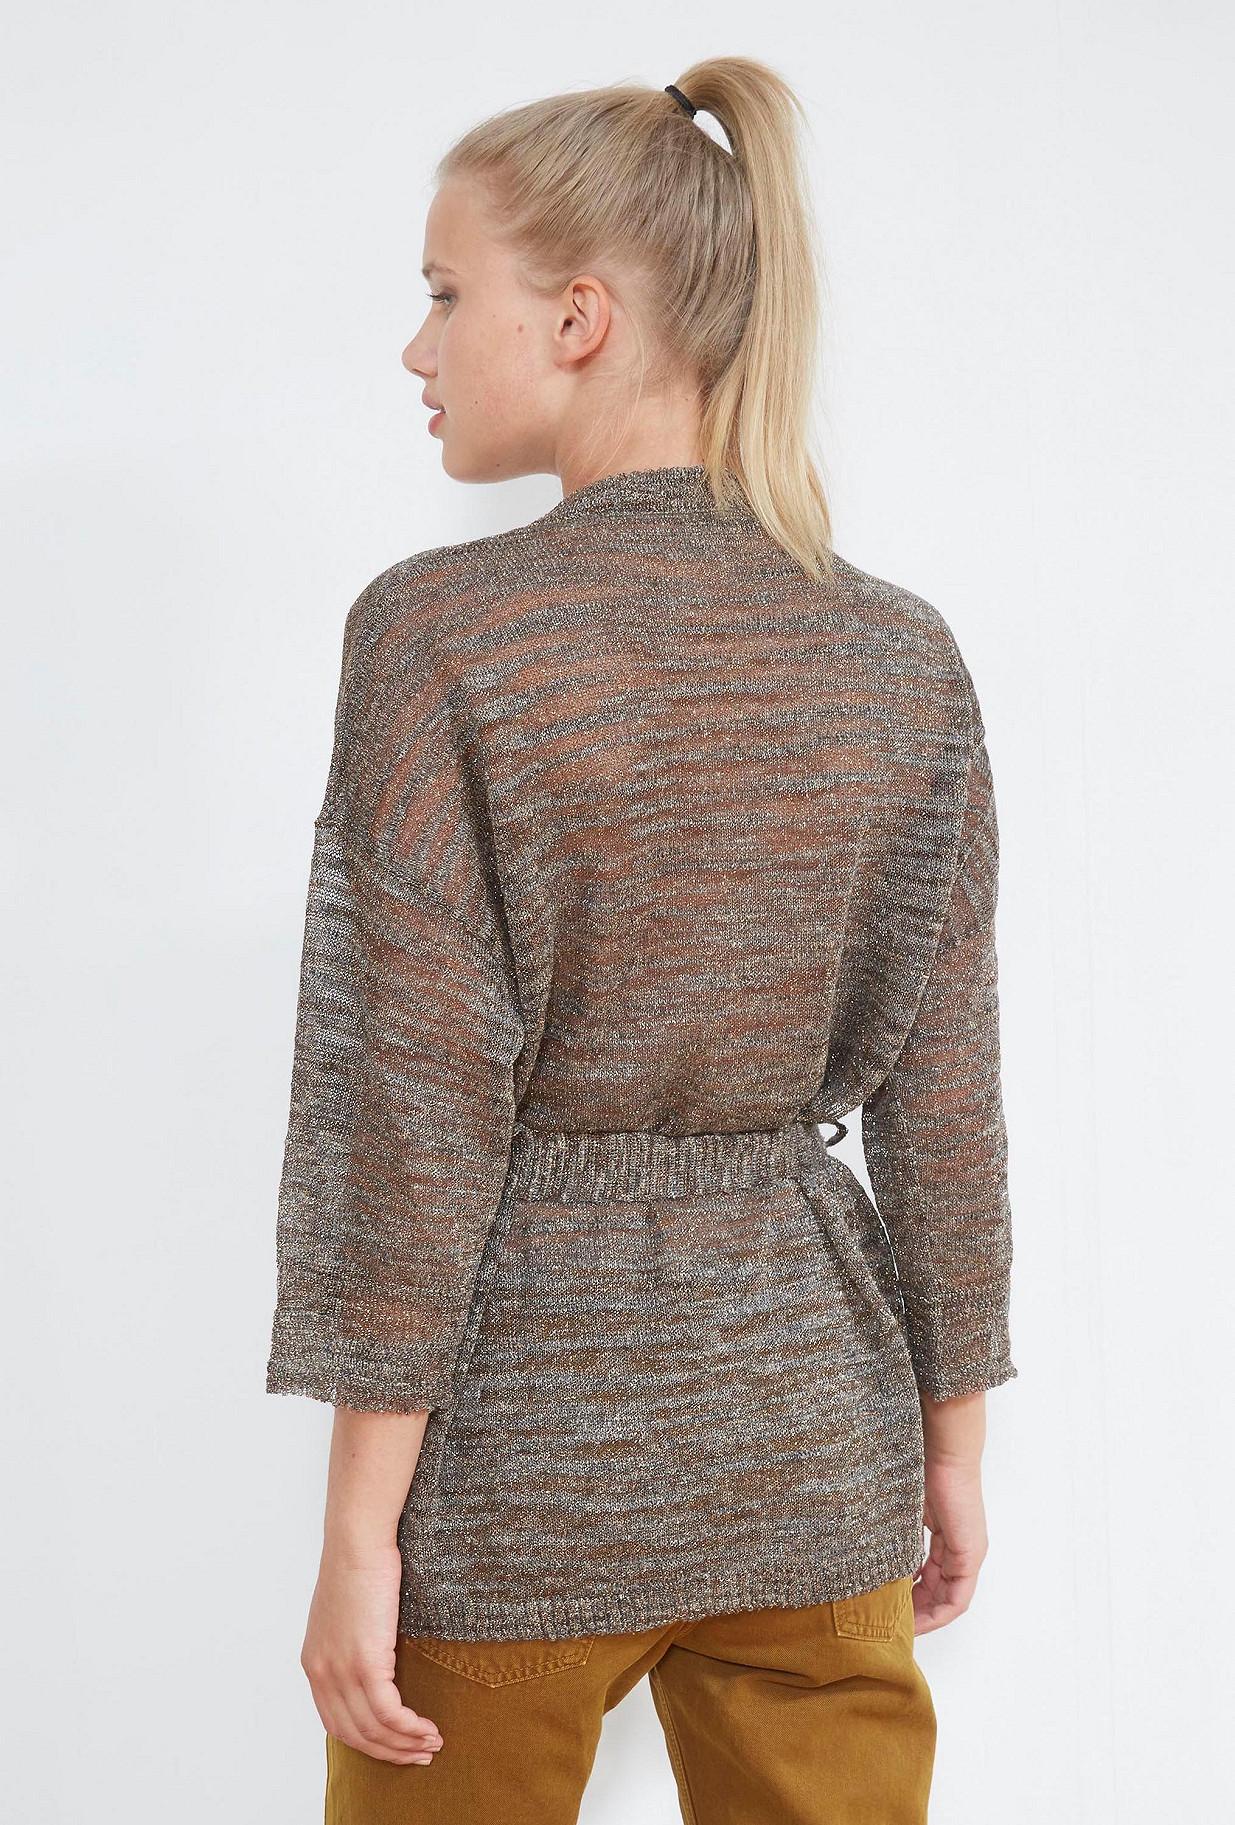 Grey  KNITTED  Bess Mes demoiselles fashion clothes designer Paris